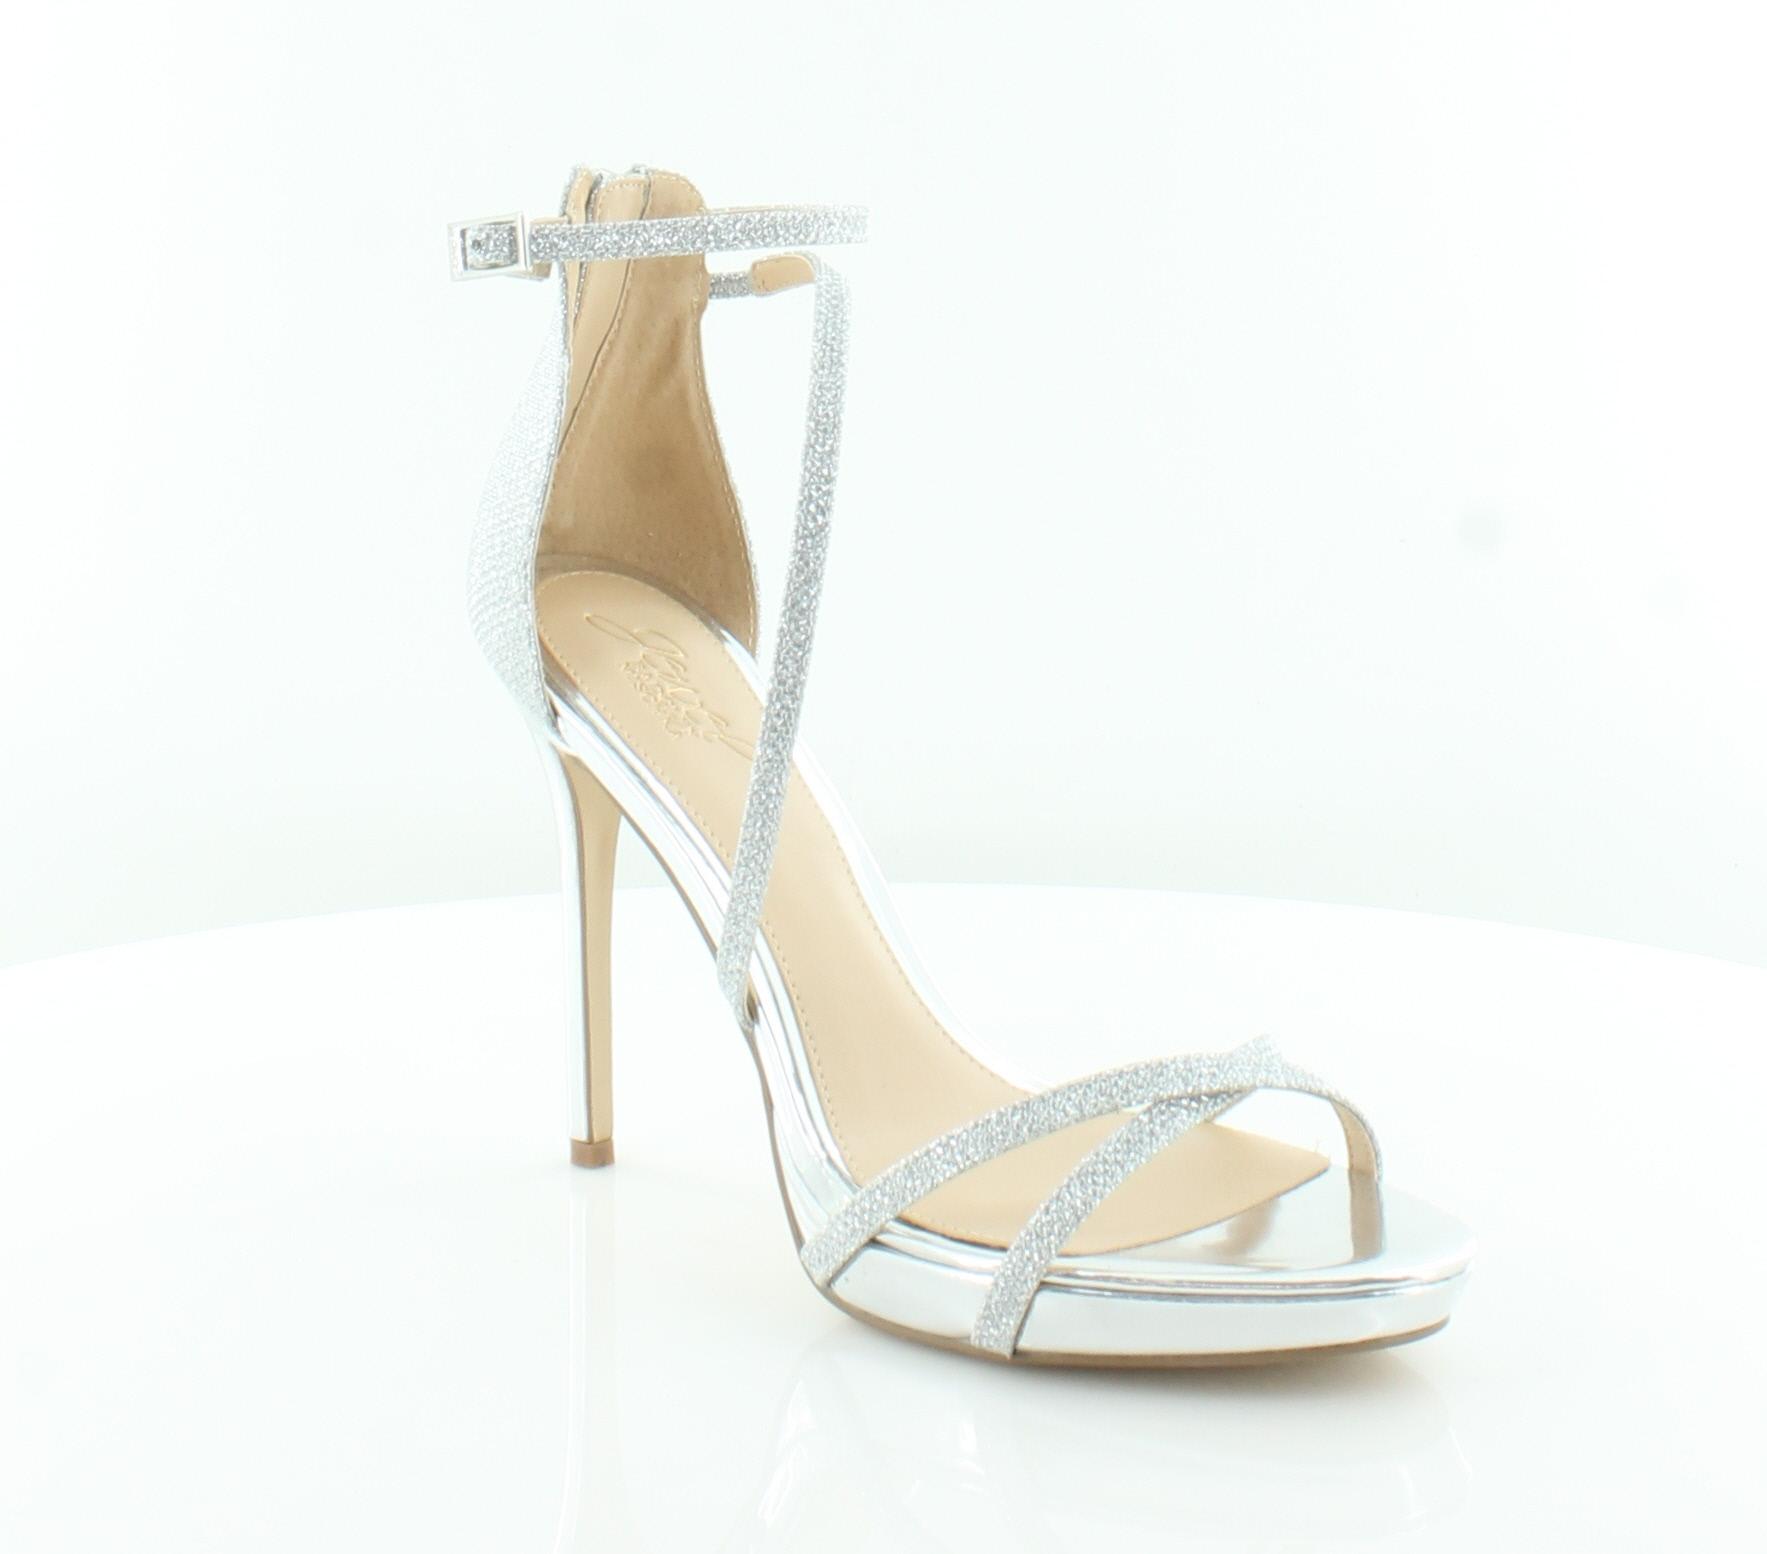 5e156dce5e2e Jewel Badgley Mischka New Galen Metallic Womens Shoes Size 9 M Heels ...